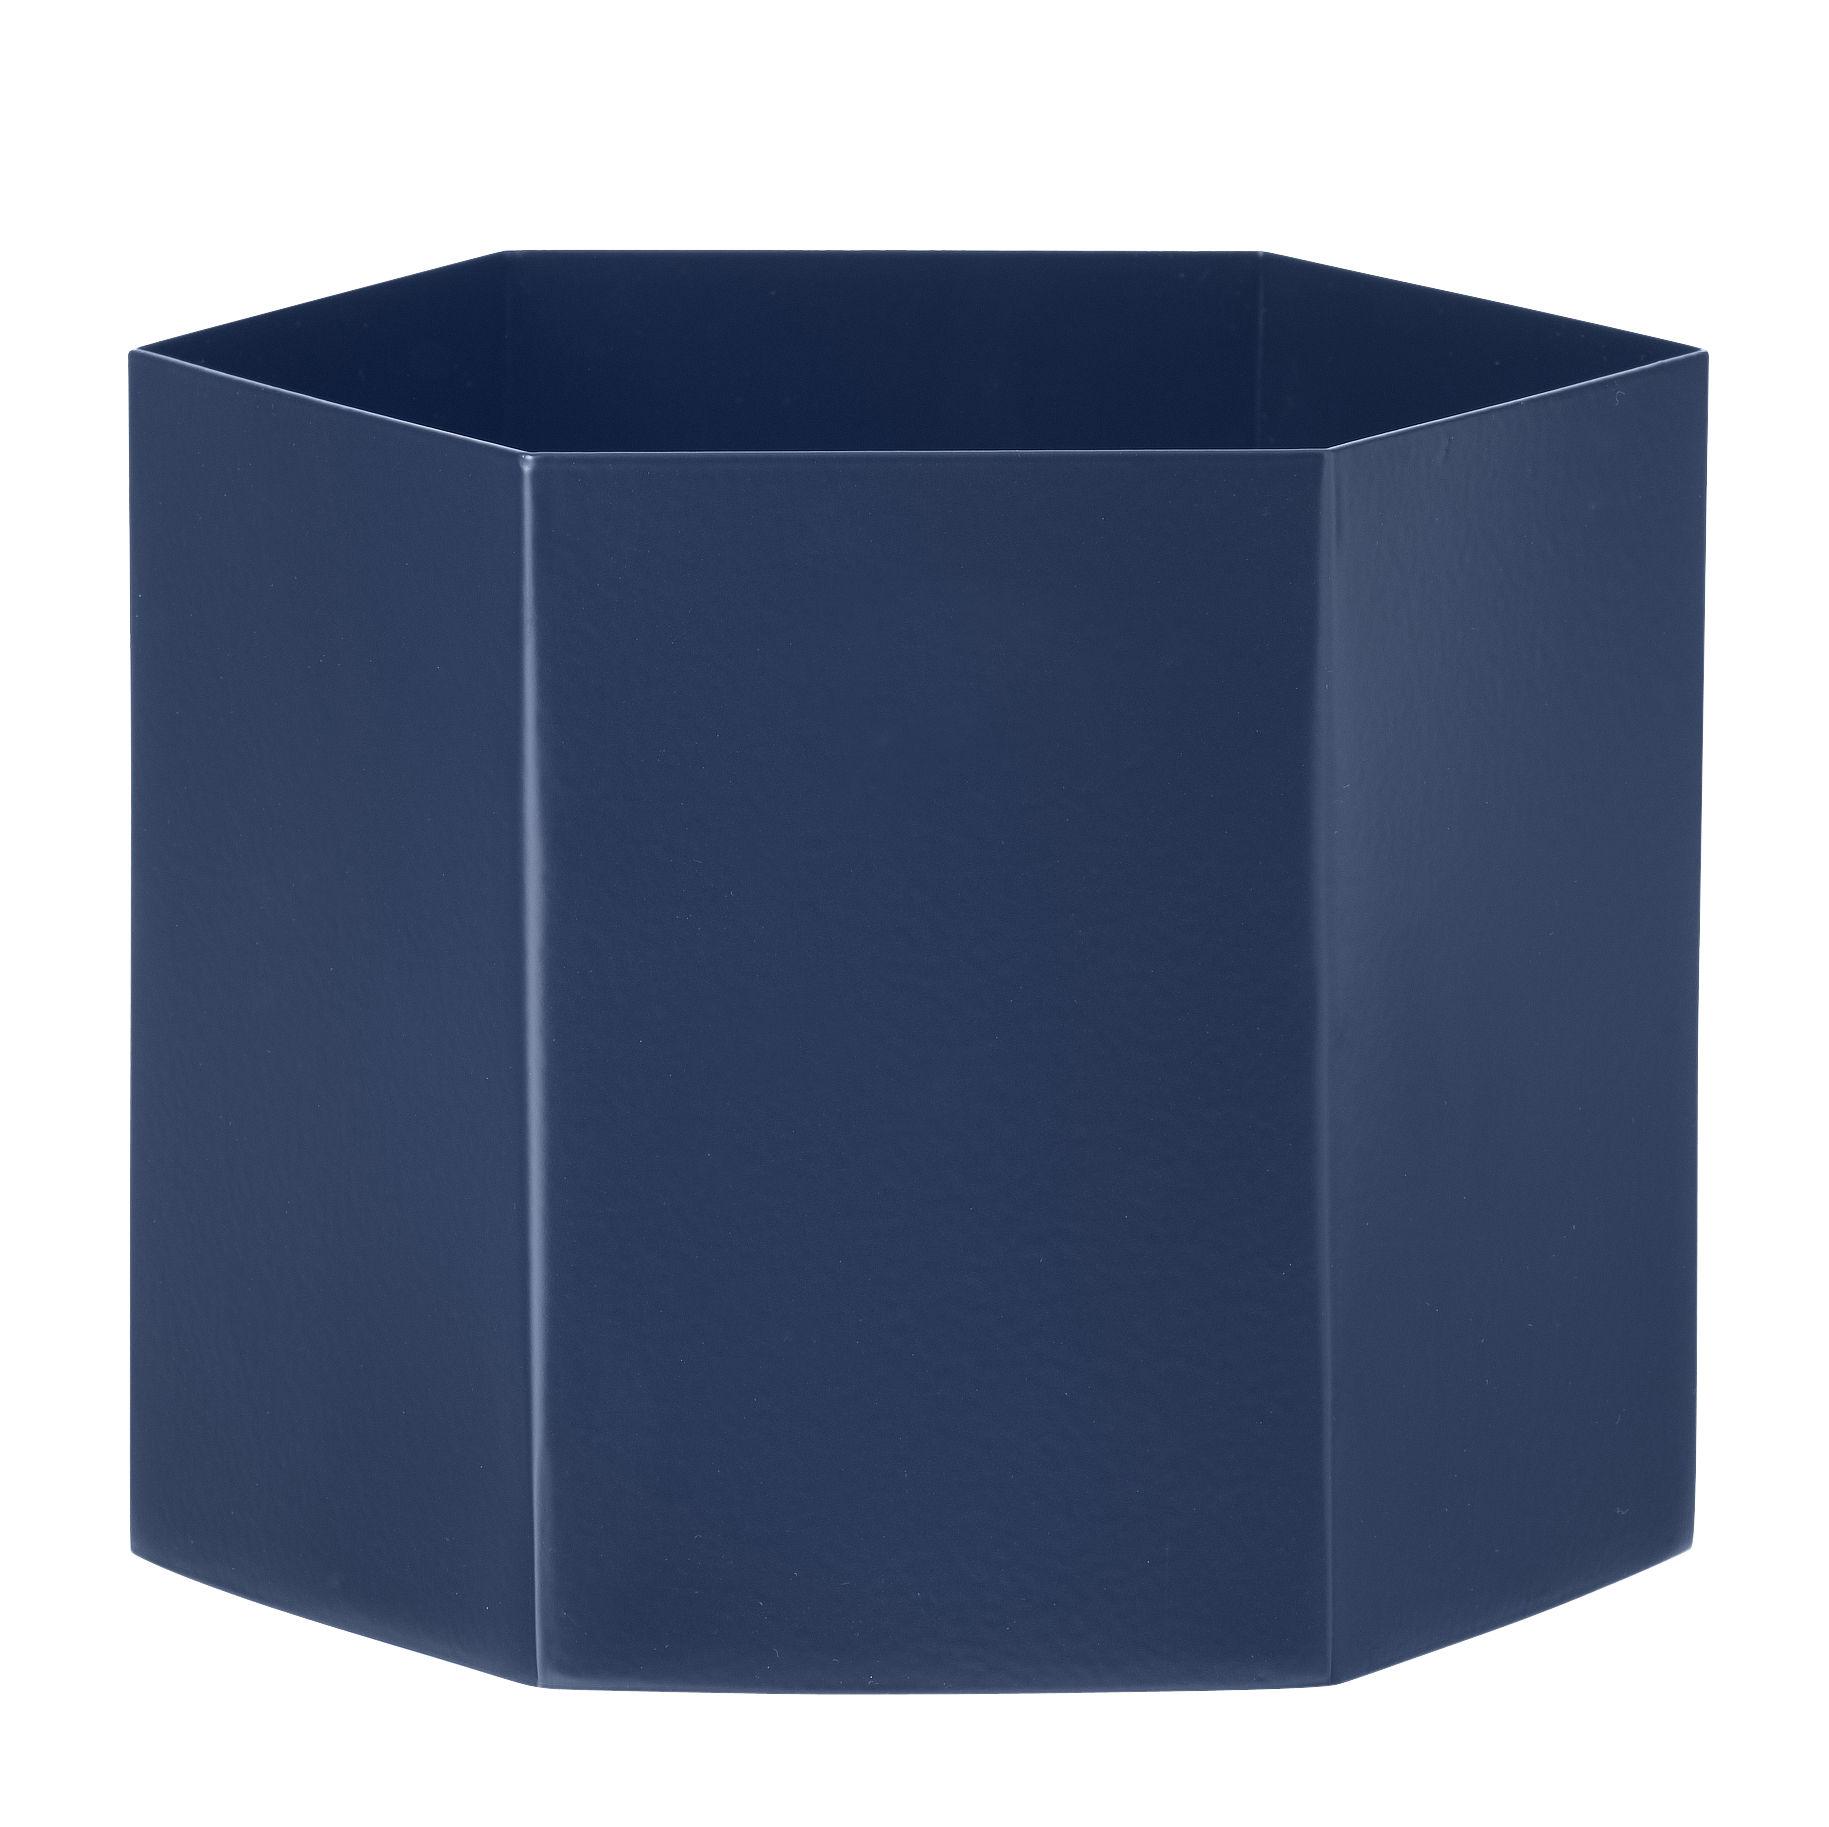 Interni - Vasi - Vaso Hexagon / Large - Ø 18 cm - Ferm Living - Blu - metallo laccato